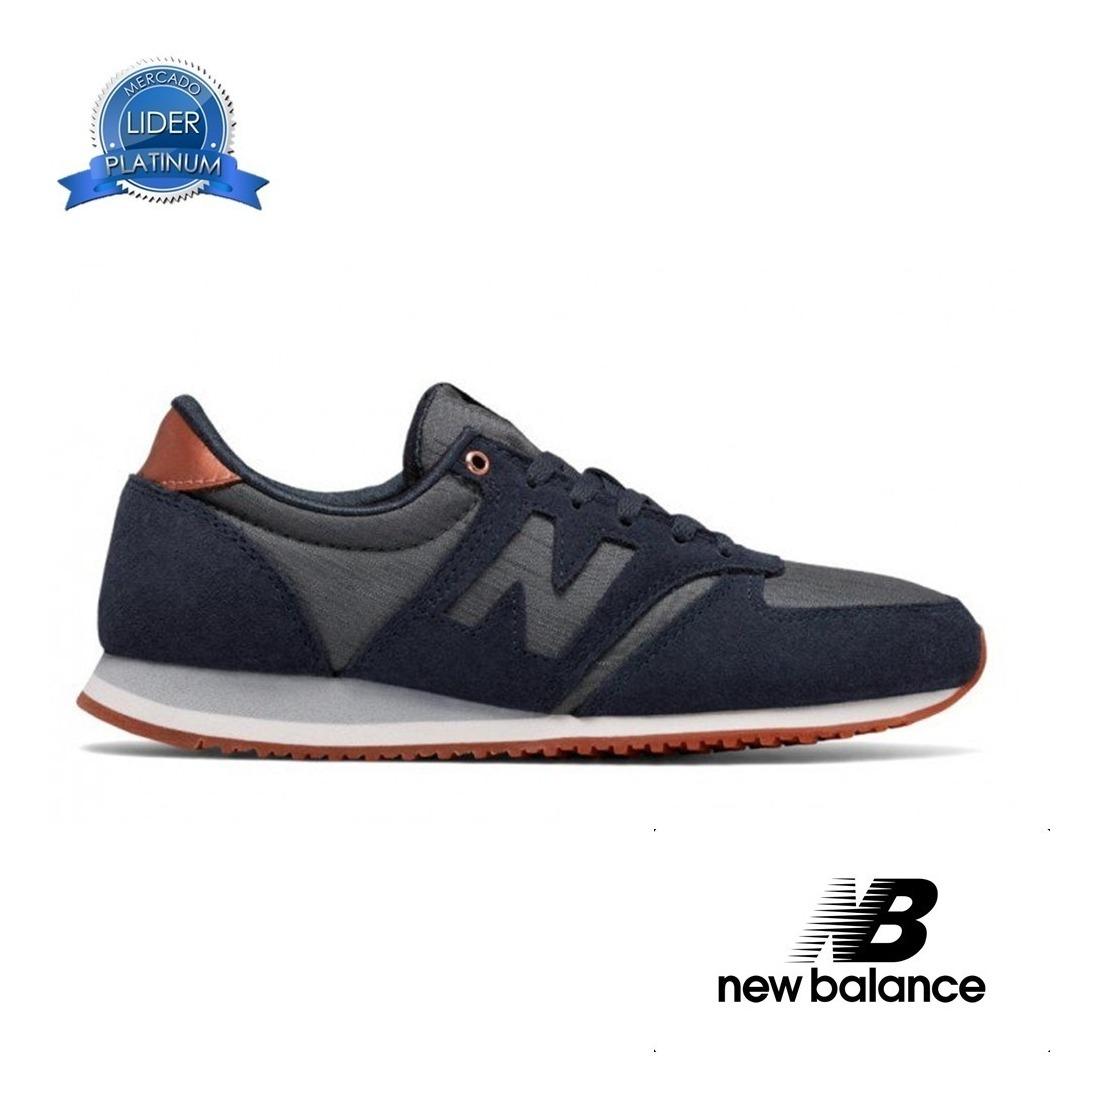 zapatillas new balance 420 mujer 37